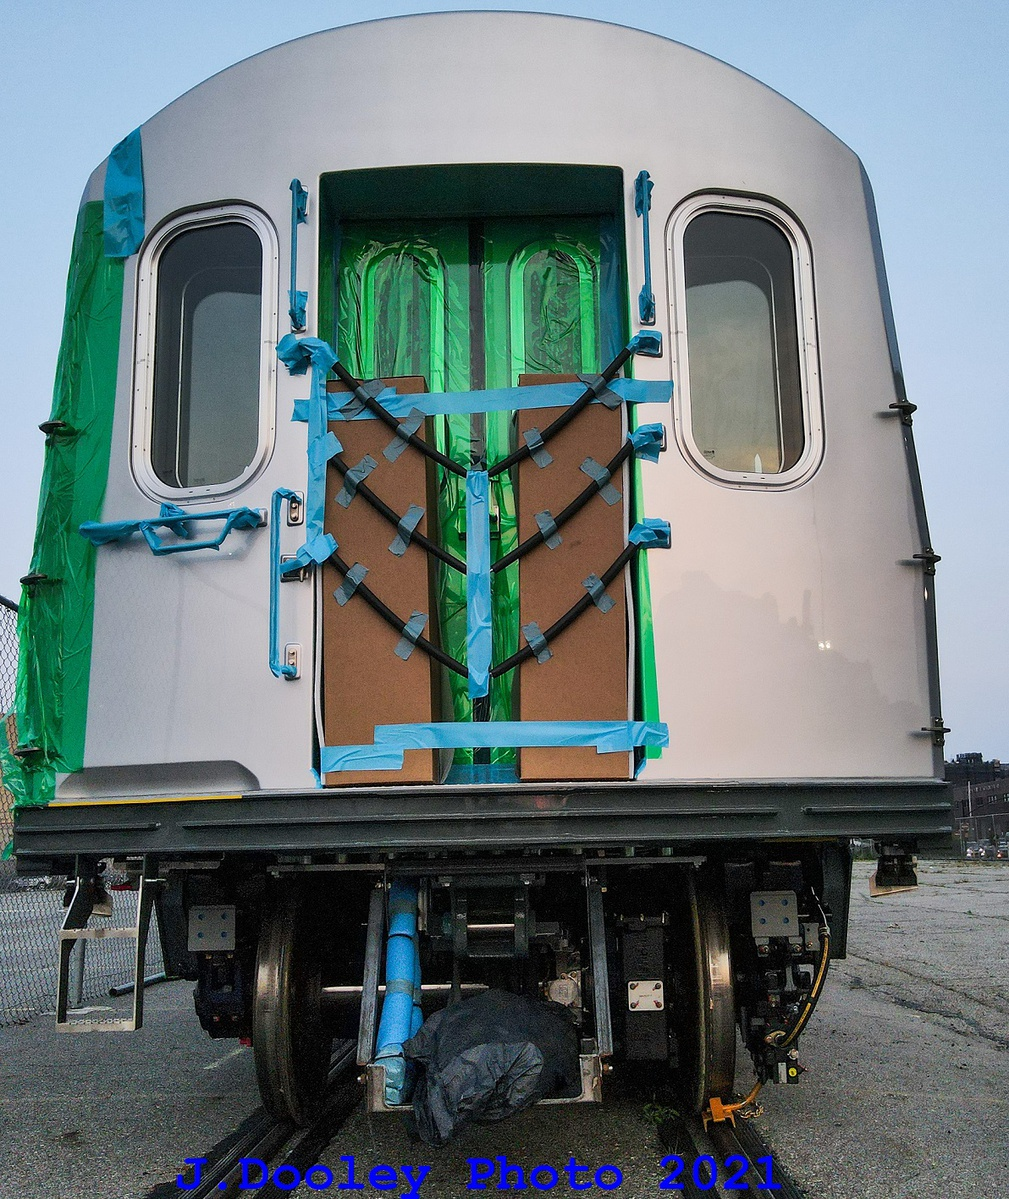 (562k, 1009x1199)<br><b>Country:</b> United States<br><b>City:</b> New York<br><b>System:</b> New York City Transit<br><b>Route:</b> Delivery<br><b>Car:</b> R-211 (Kawasaki, 2021-) 4067 <br><b>Photo by:</b> John Dooley<br><b>Date:</b> 7/15/2021<br><b>Notes:</b> Delivery at SBK yard<br><b>Viewed (this week/total):</b> 15 / 373